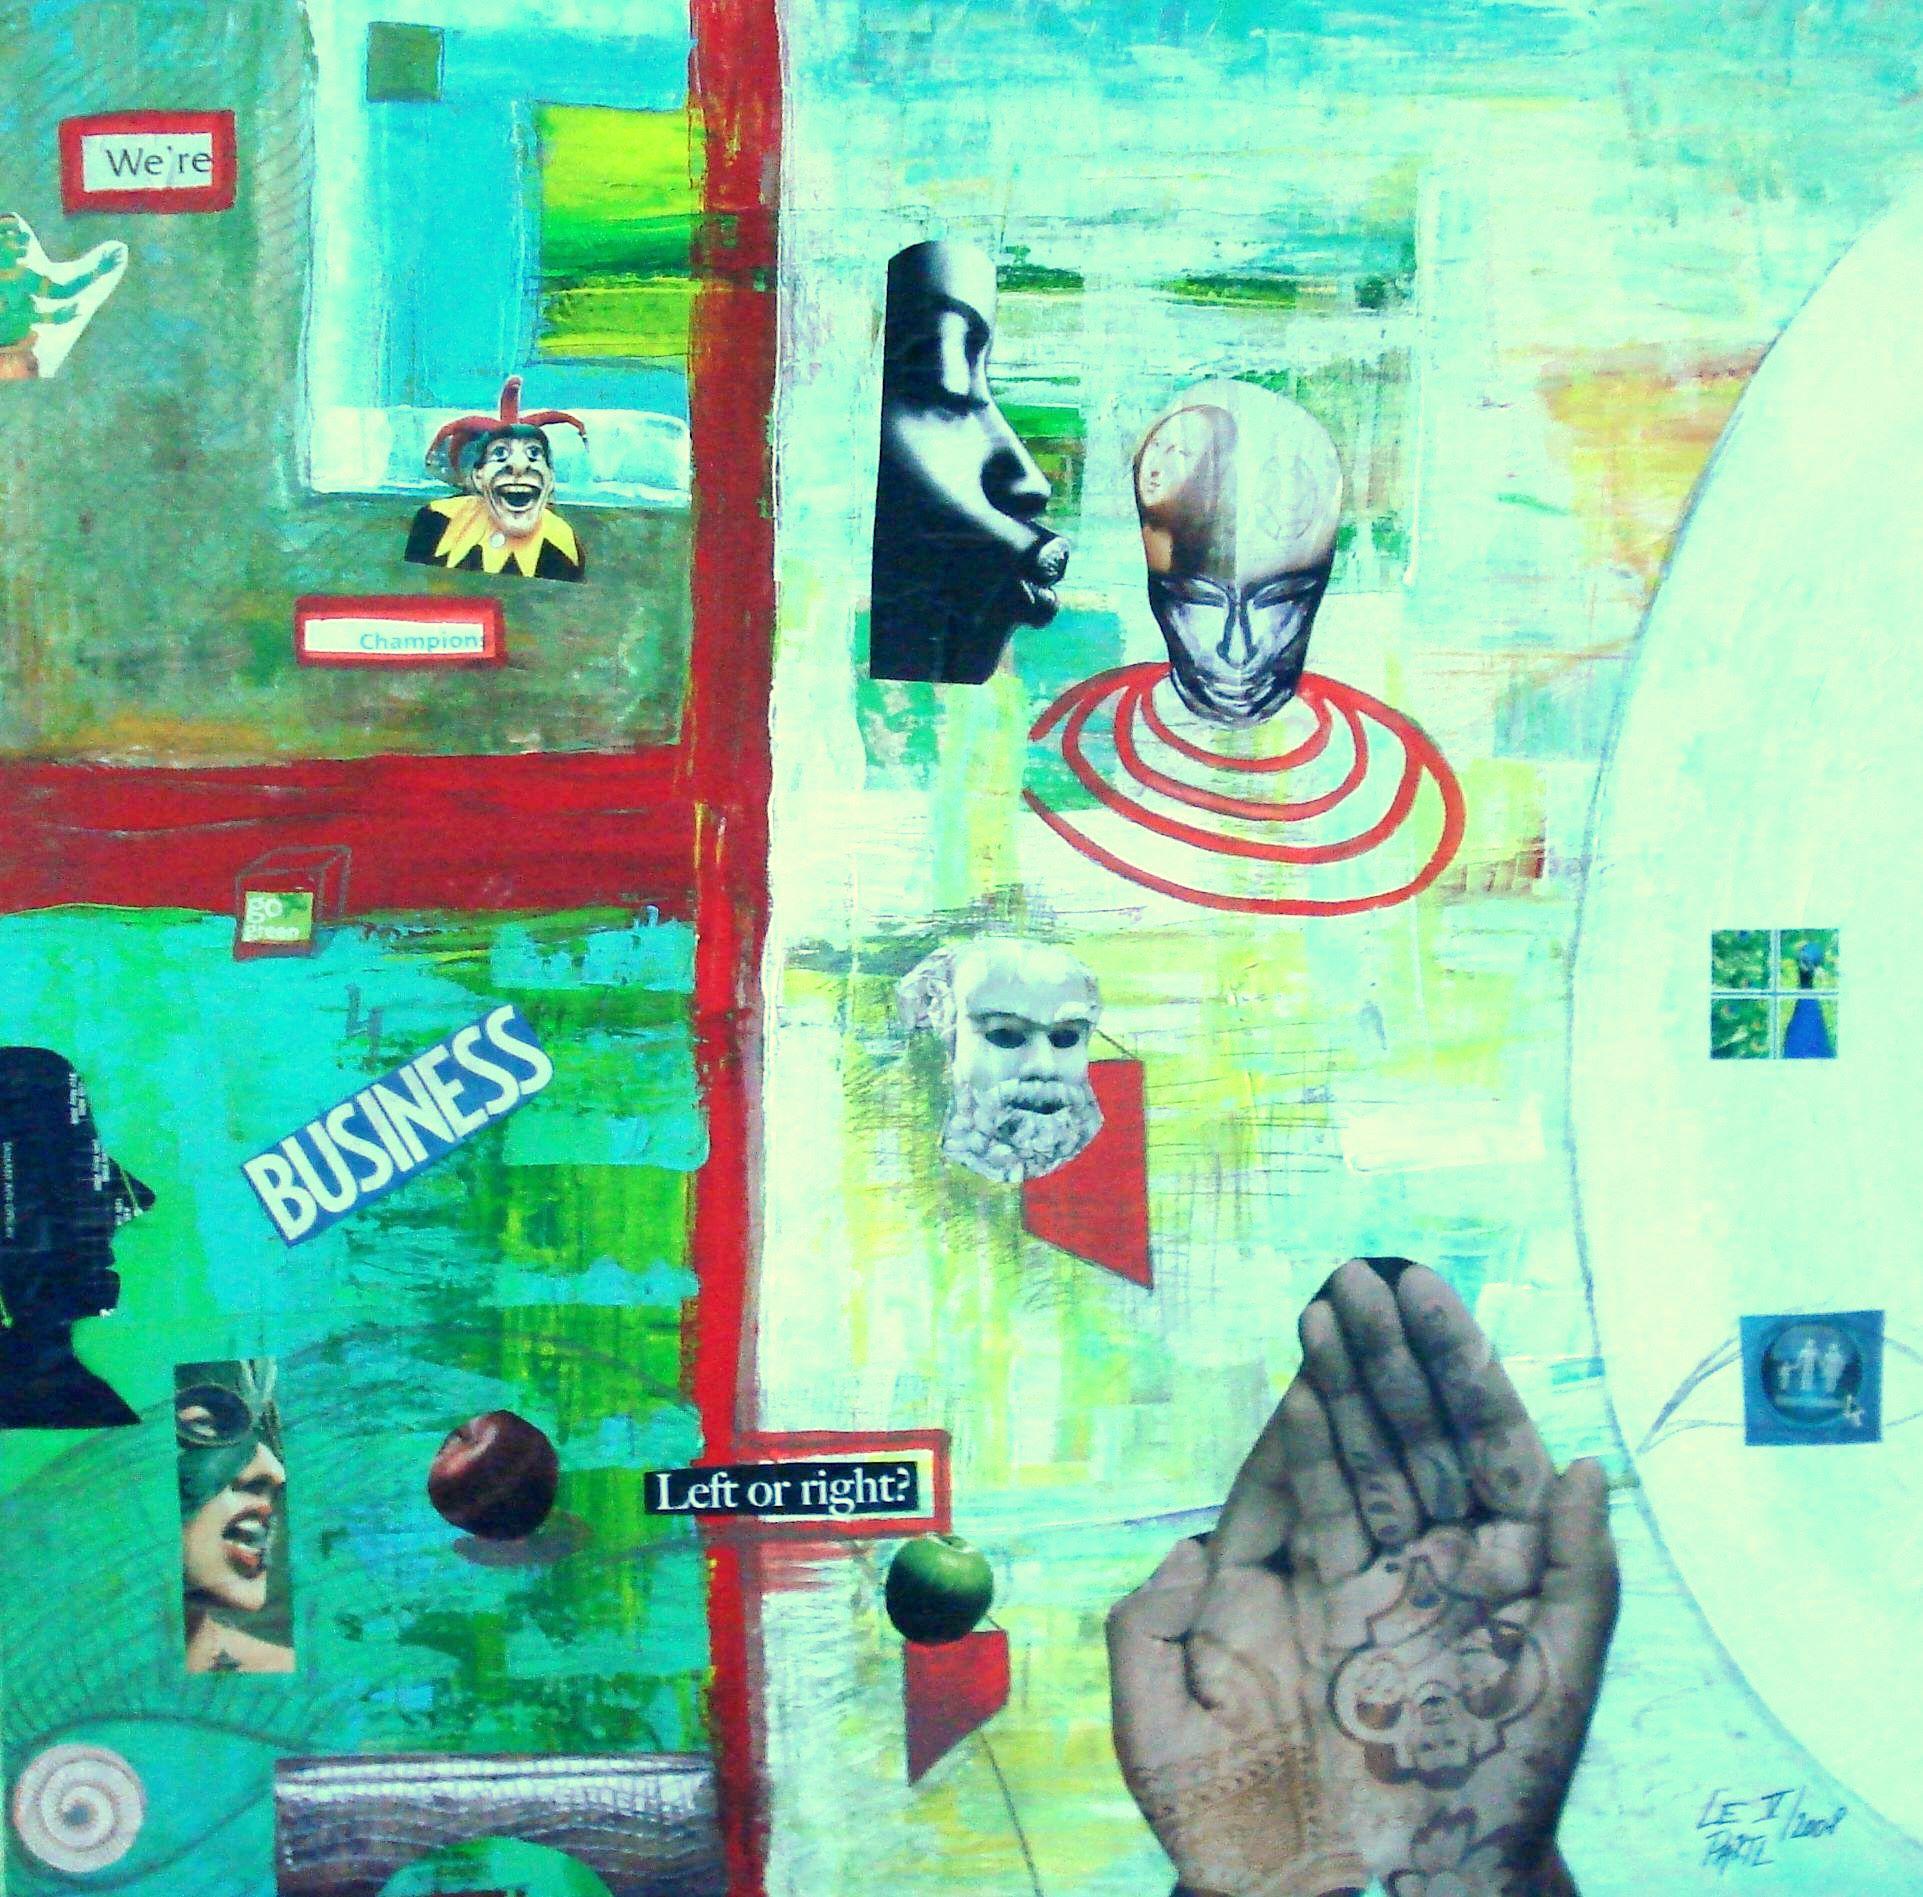 Clowns Rule artwork by Lenka Le Partl - art listed for sale on Artplode